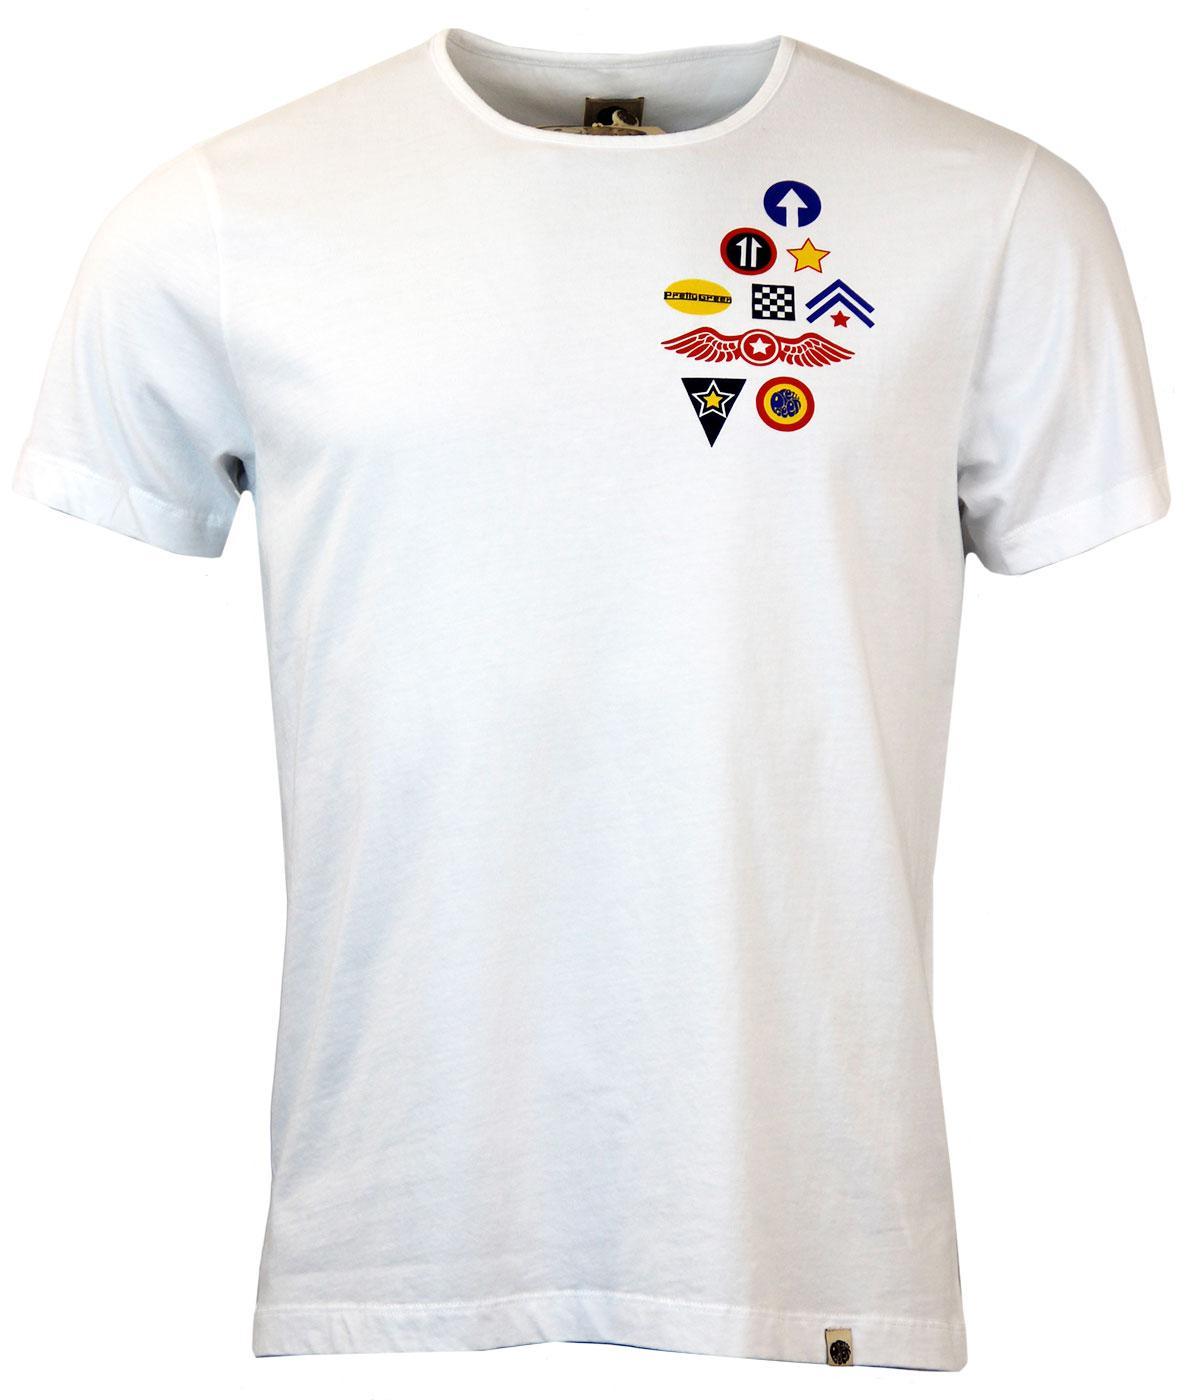 136c42cfb96 PRETTY GREEN Retro Mod 60s Pop Art Badge T-Shirt in White